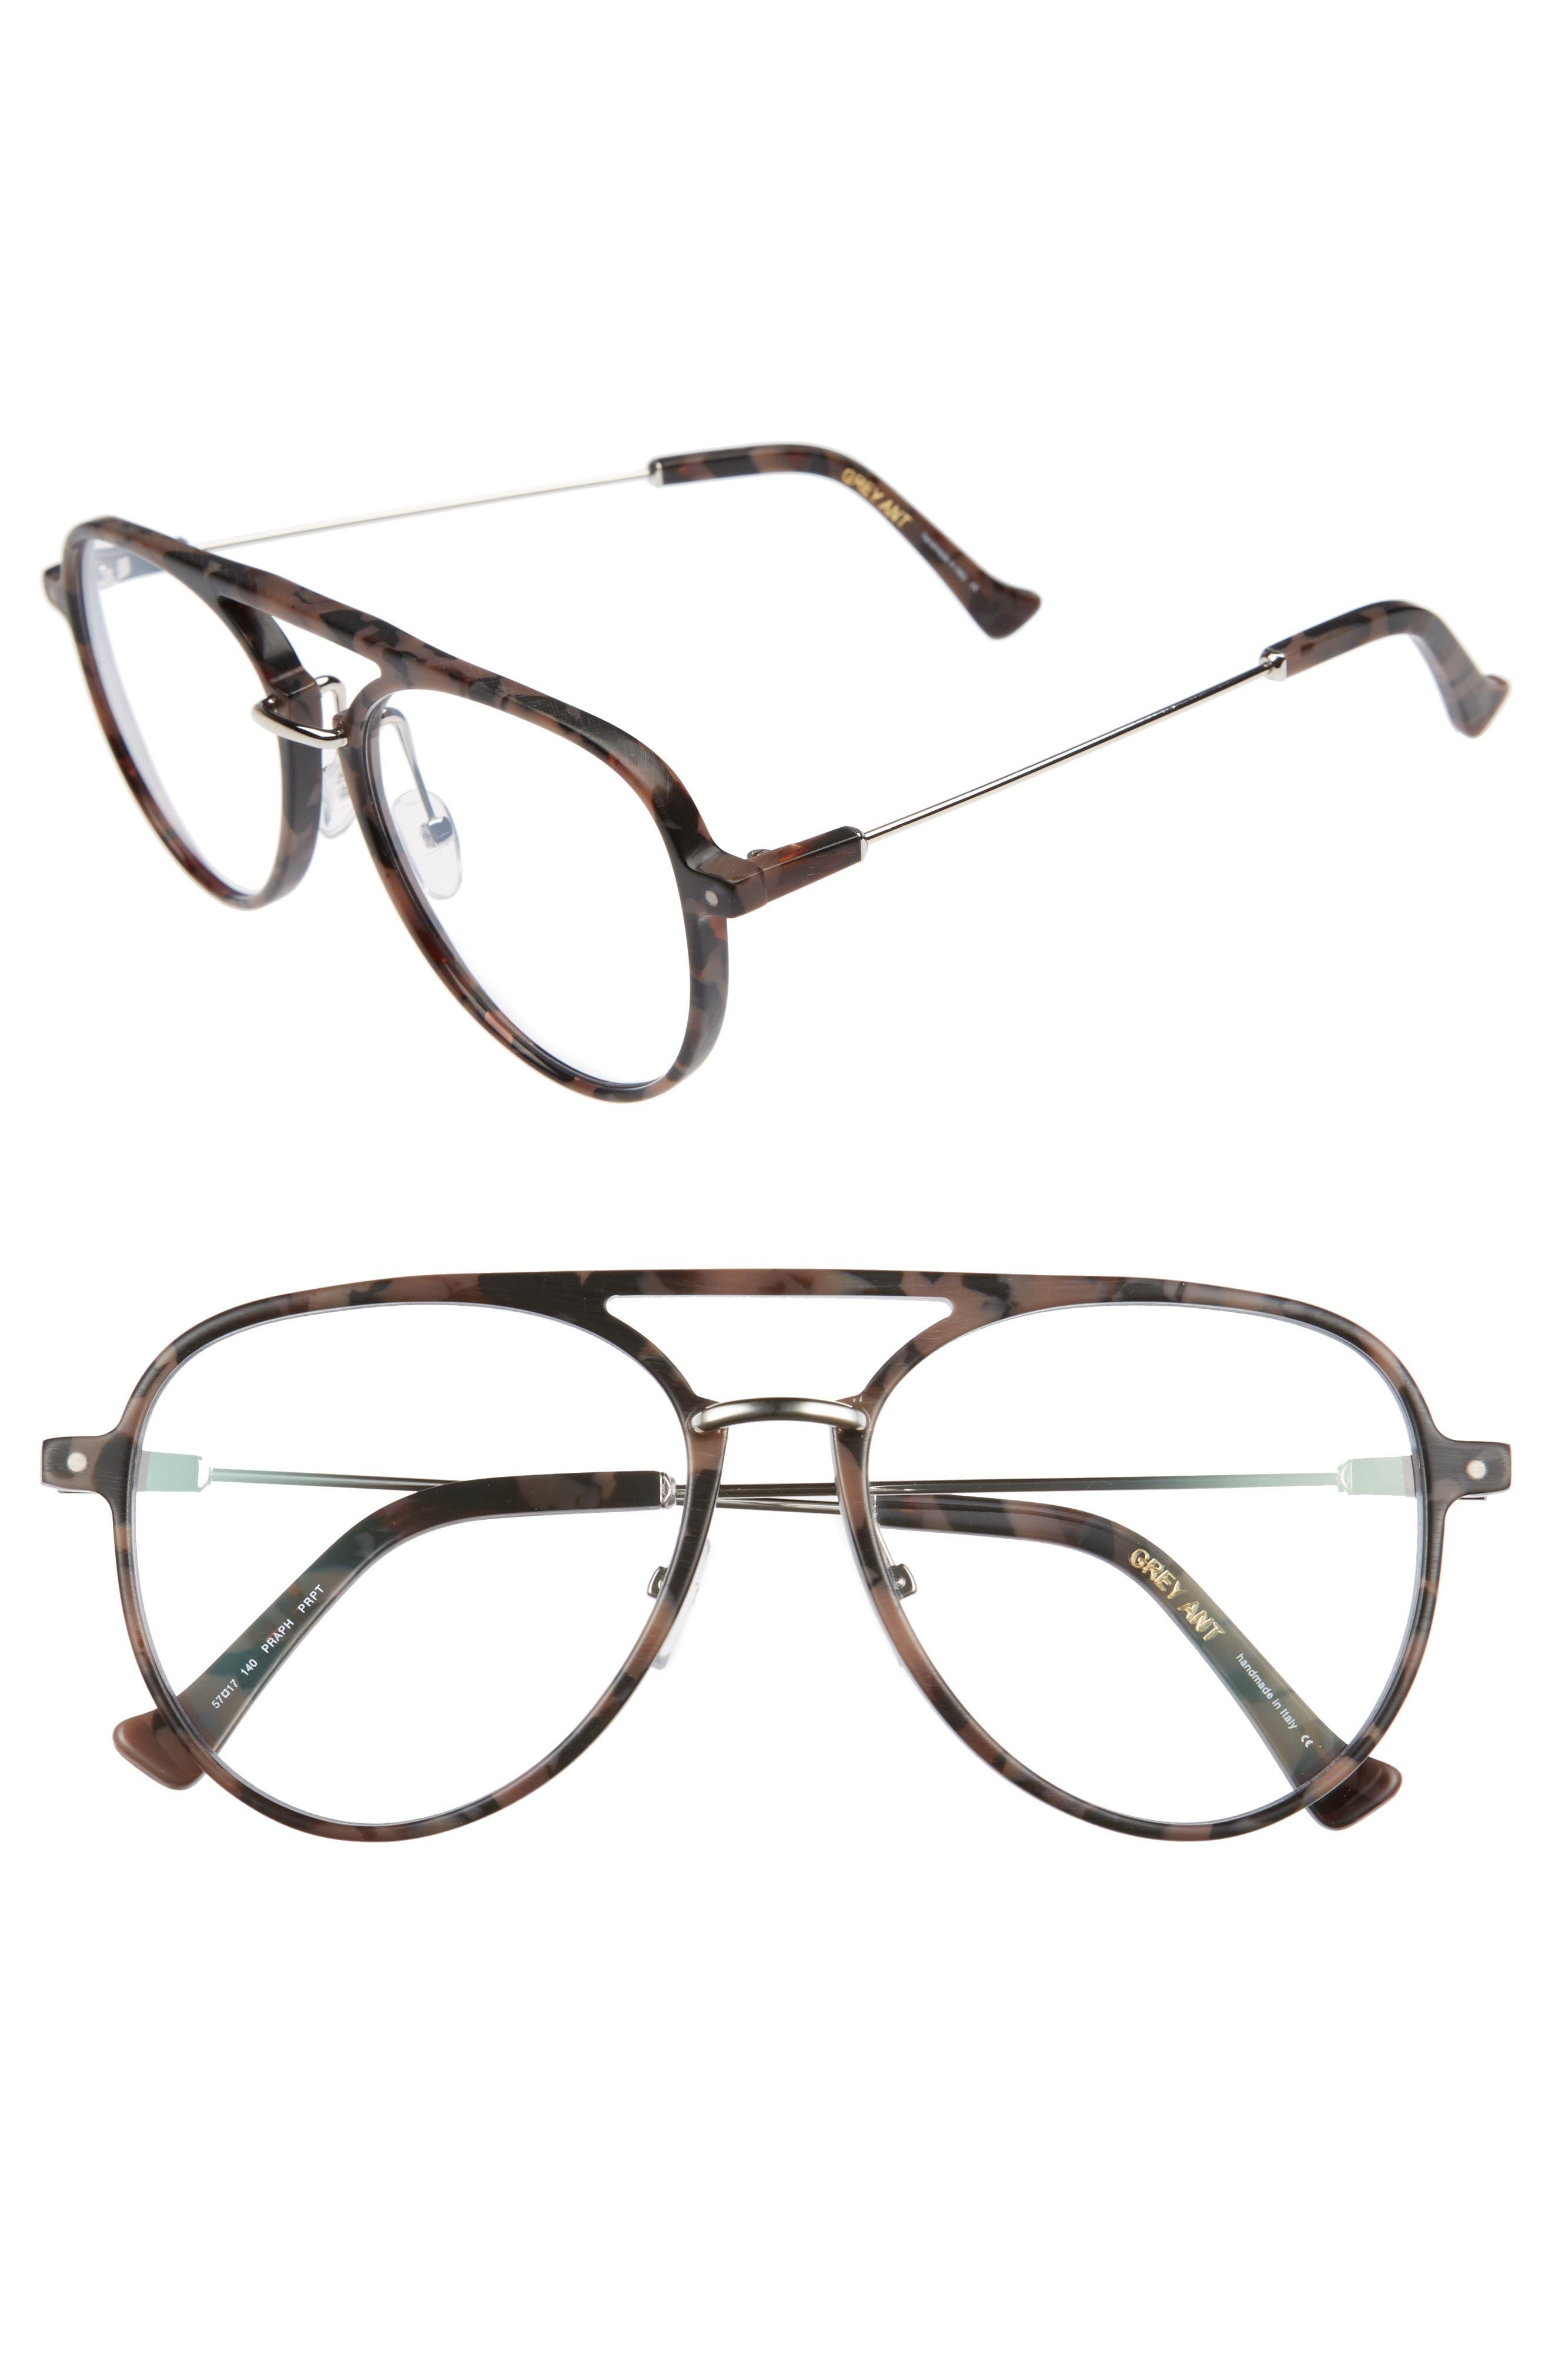 Praph 57mm Optical Glasses,                             Main thumbnail 1, color,                             ROSE TORTOISE/ OPTICAL